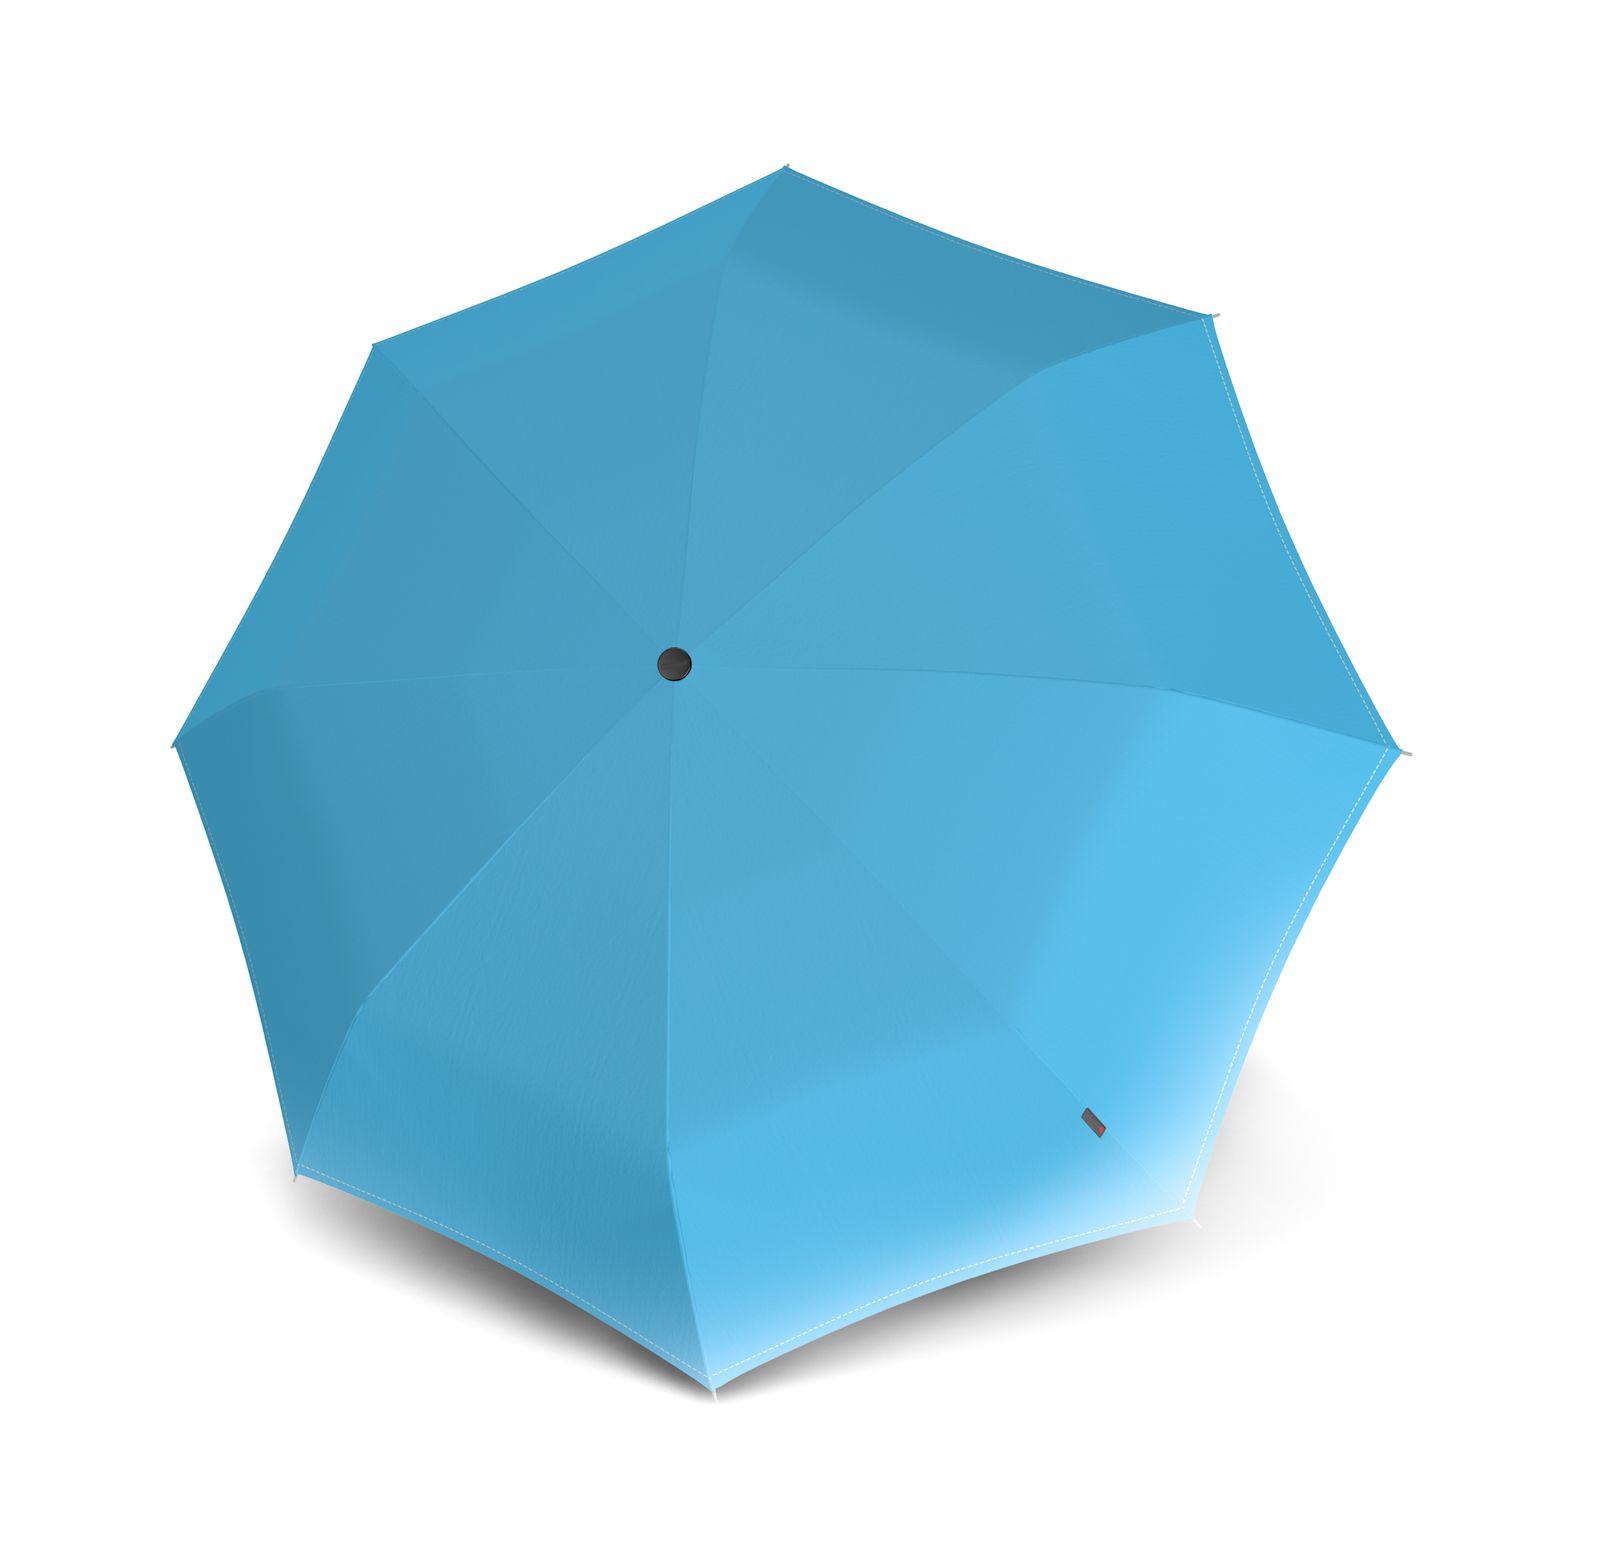 Knirps T.010 Small Manual Regenschirm Audrey Blue Blau